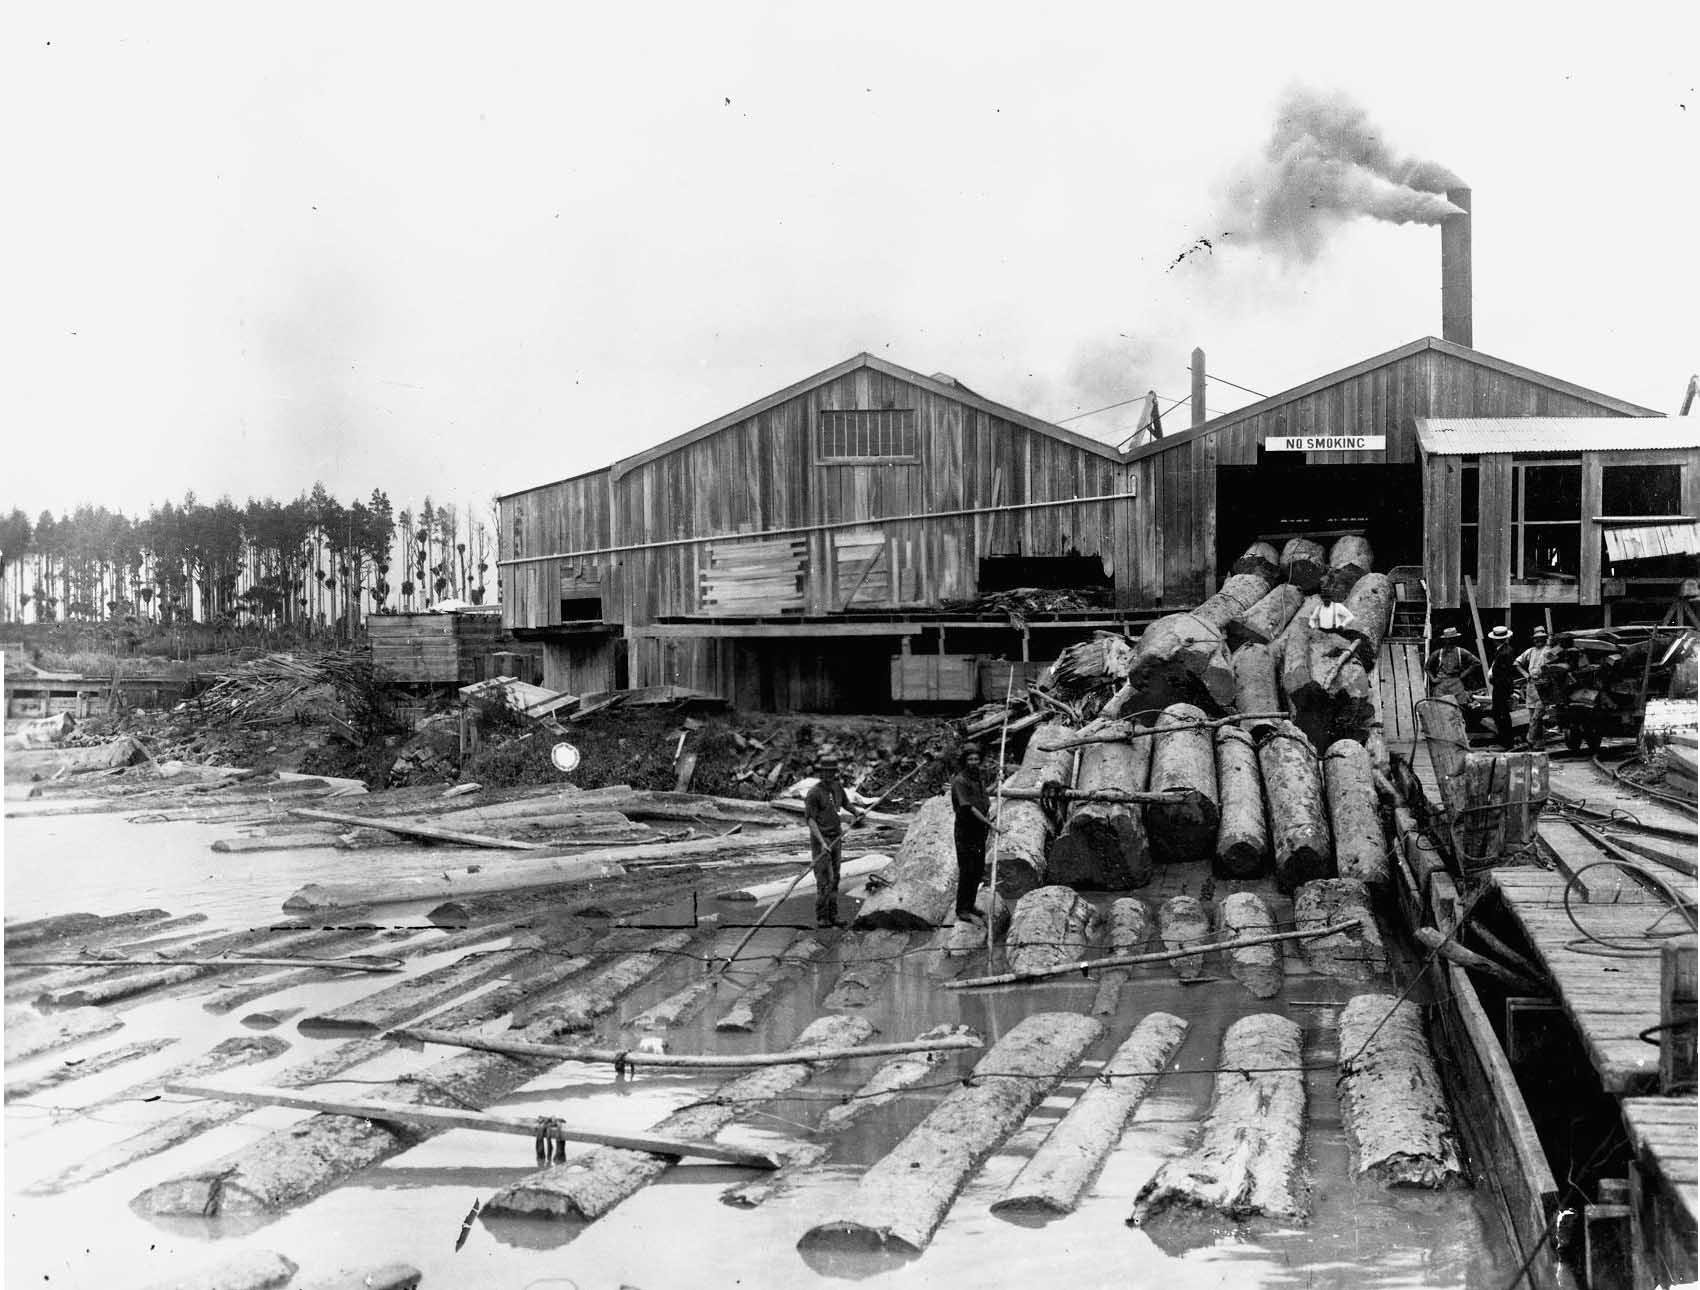 Aoroa timber mills, Wairoa River Date: 1900